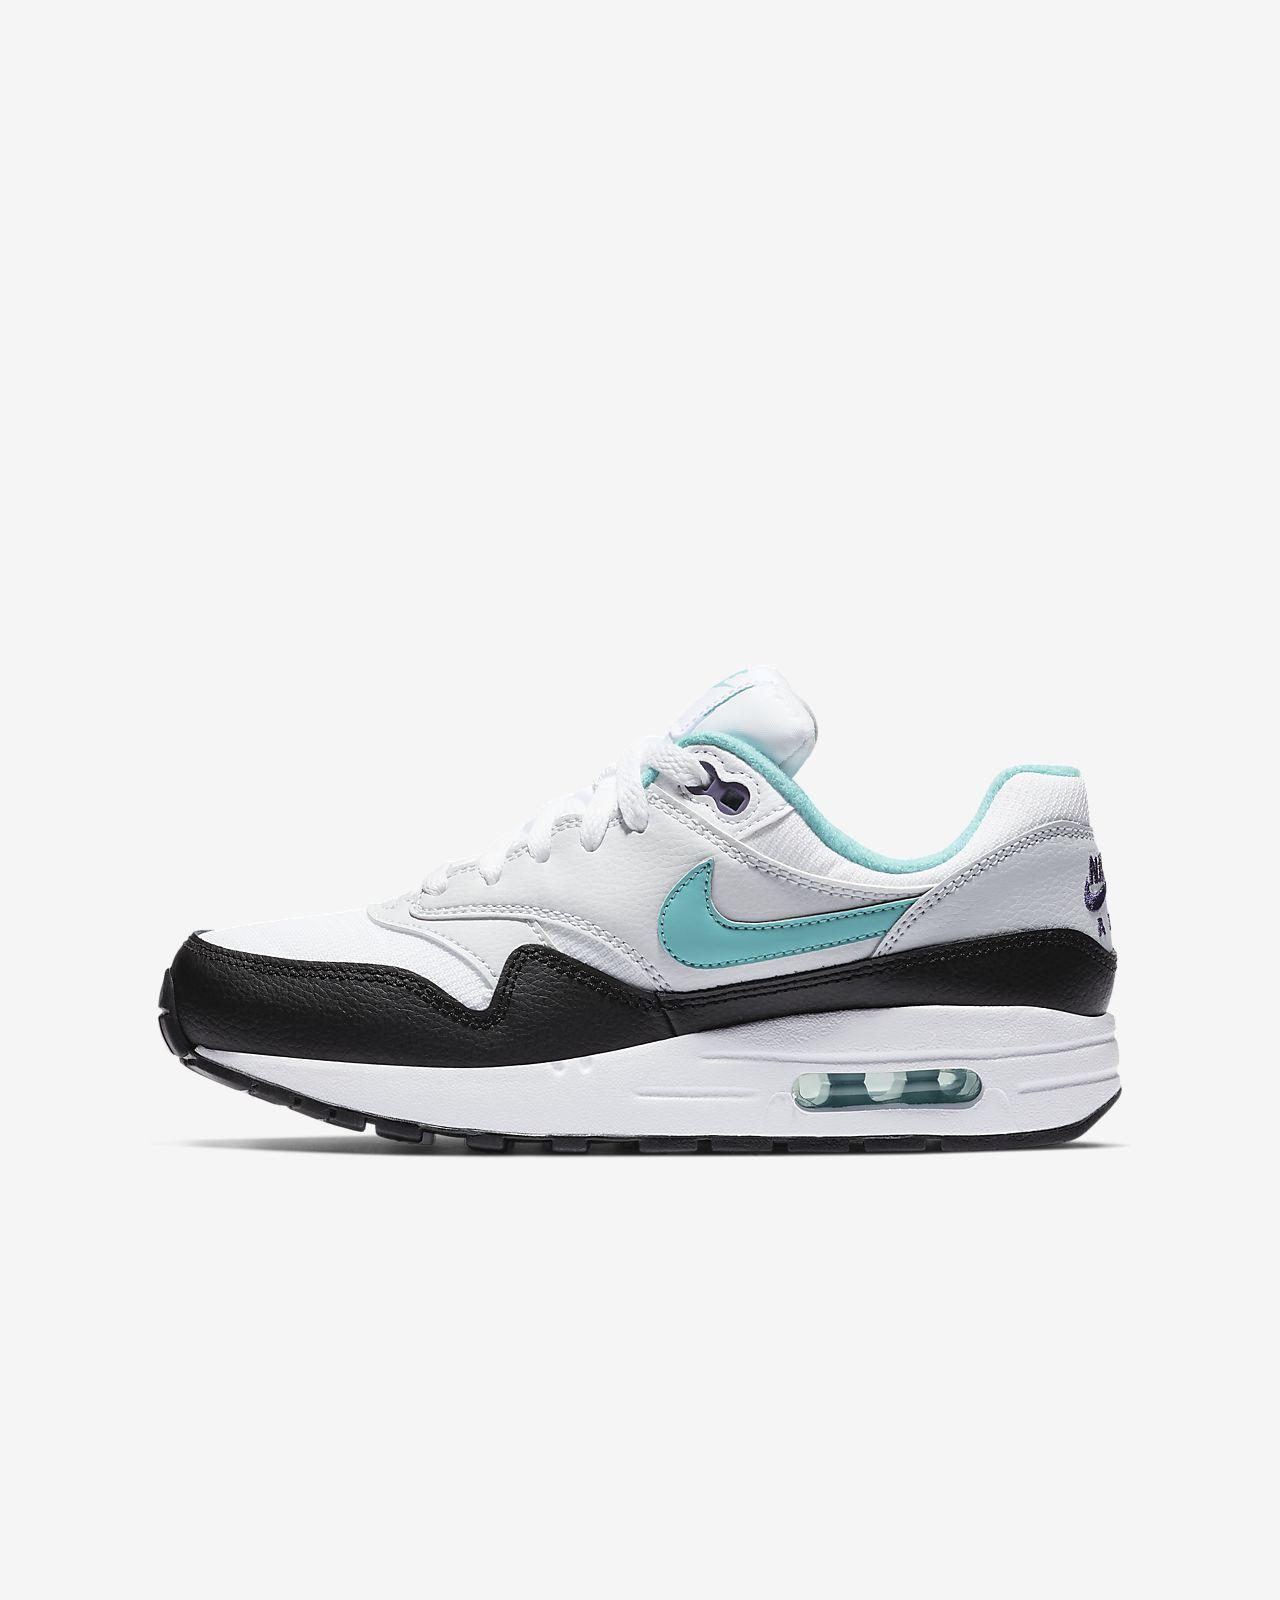 1c852398c2 Nike Air Max 1 Big Kids  Shoe. Nike.com